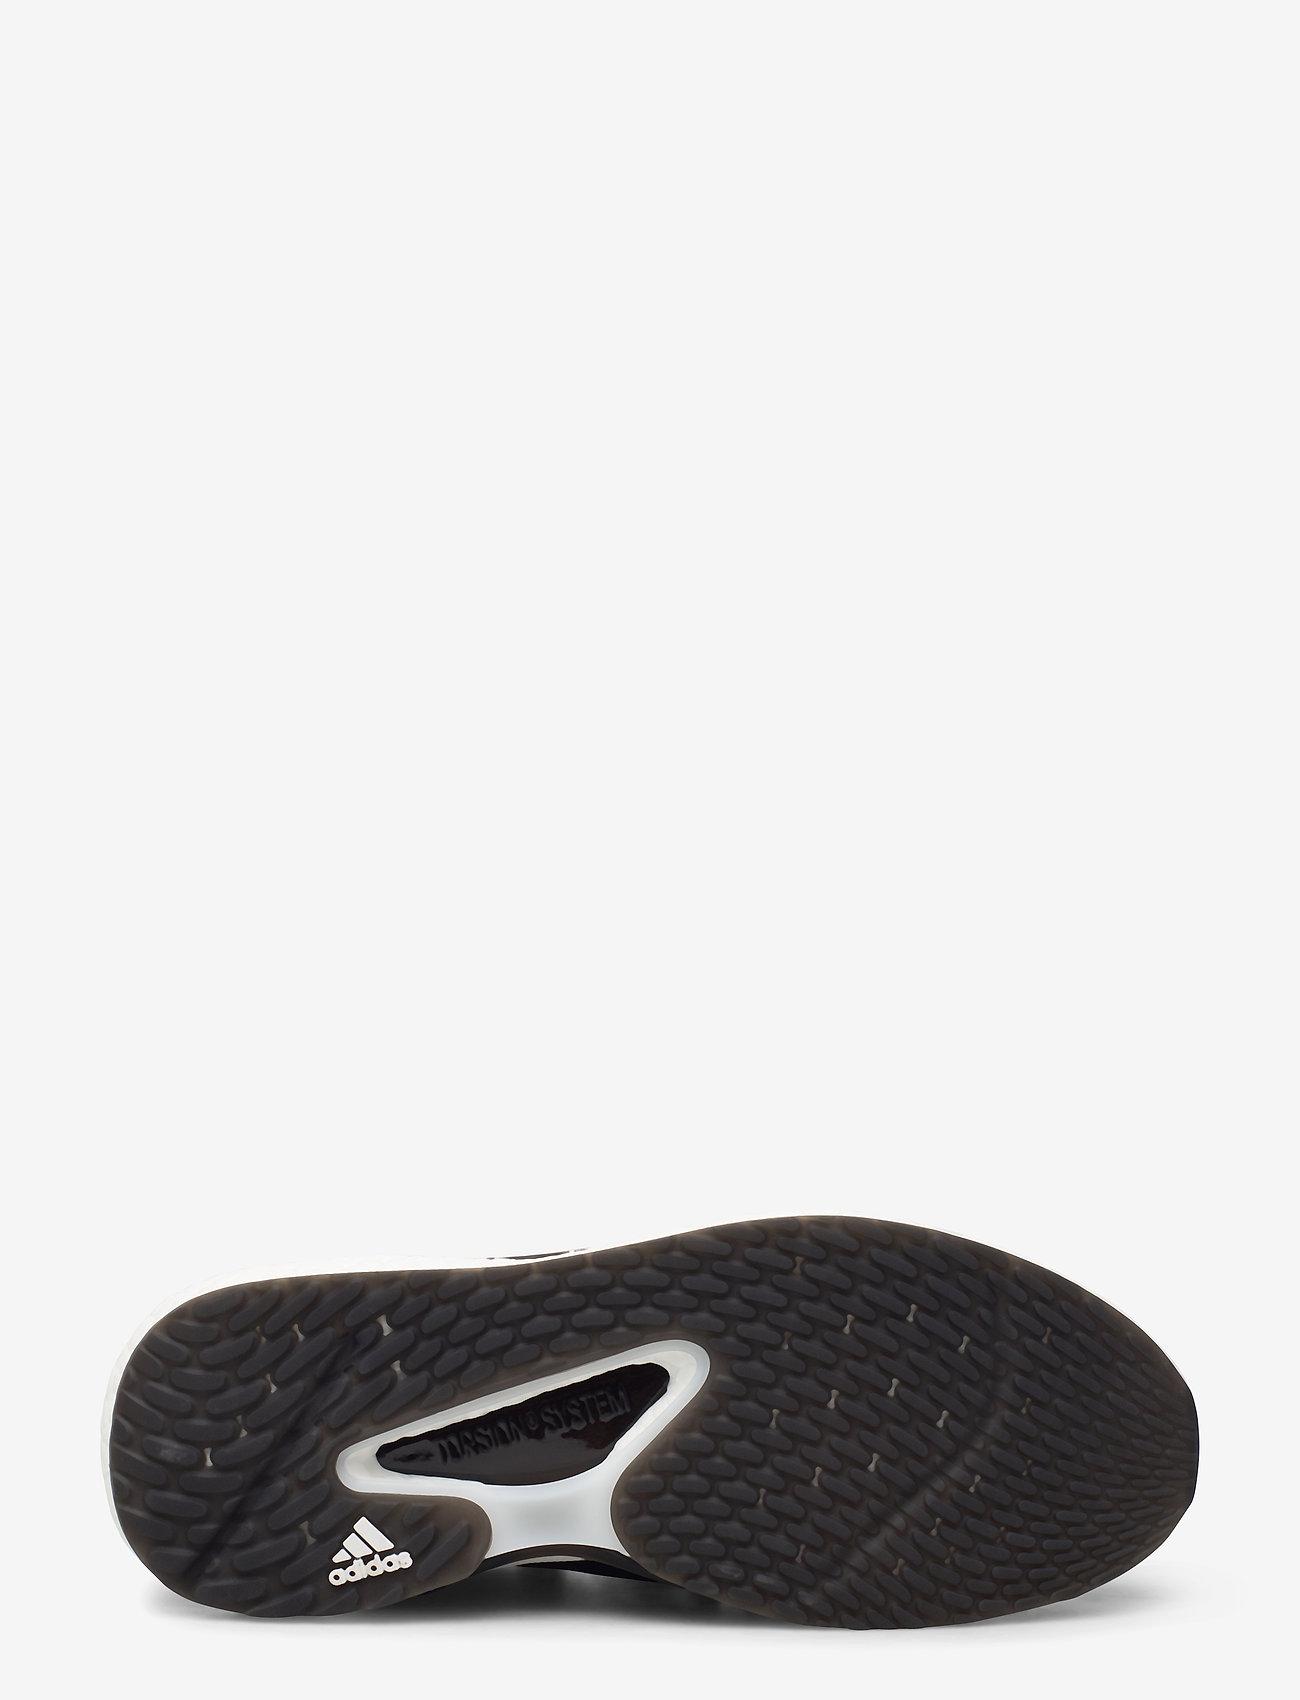 Alphatorsion Boost M (Cblack/cblack/ftwwht) (90.97 €) - adidas Performance sPGbq